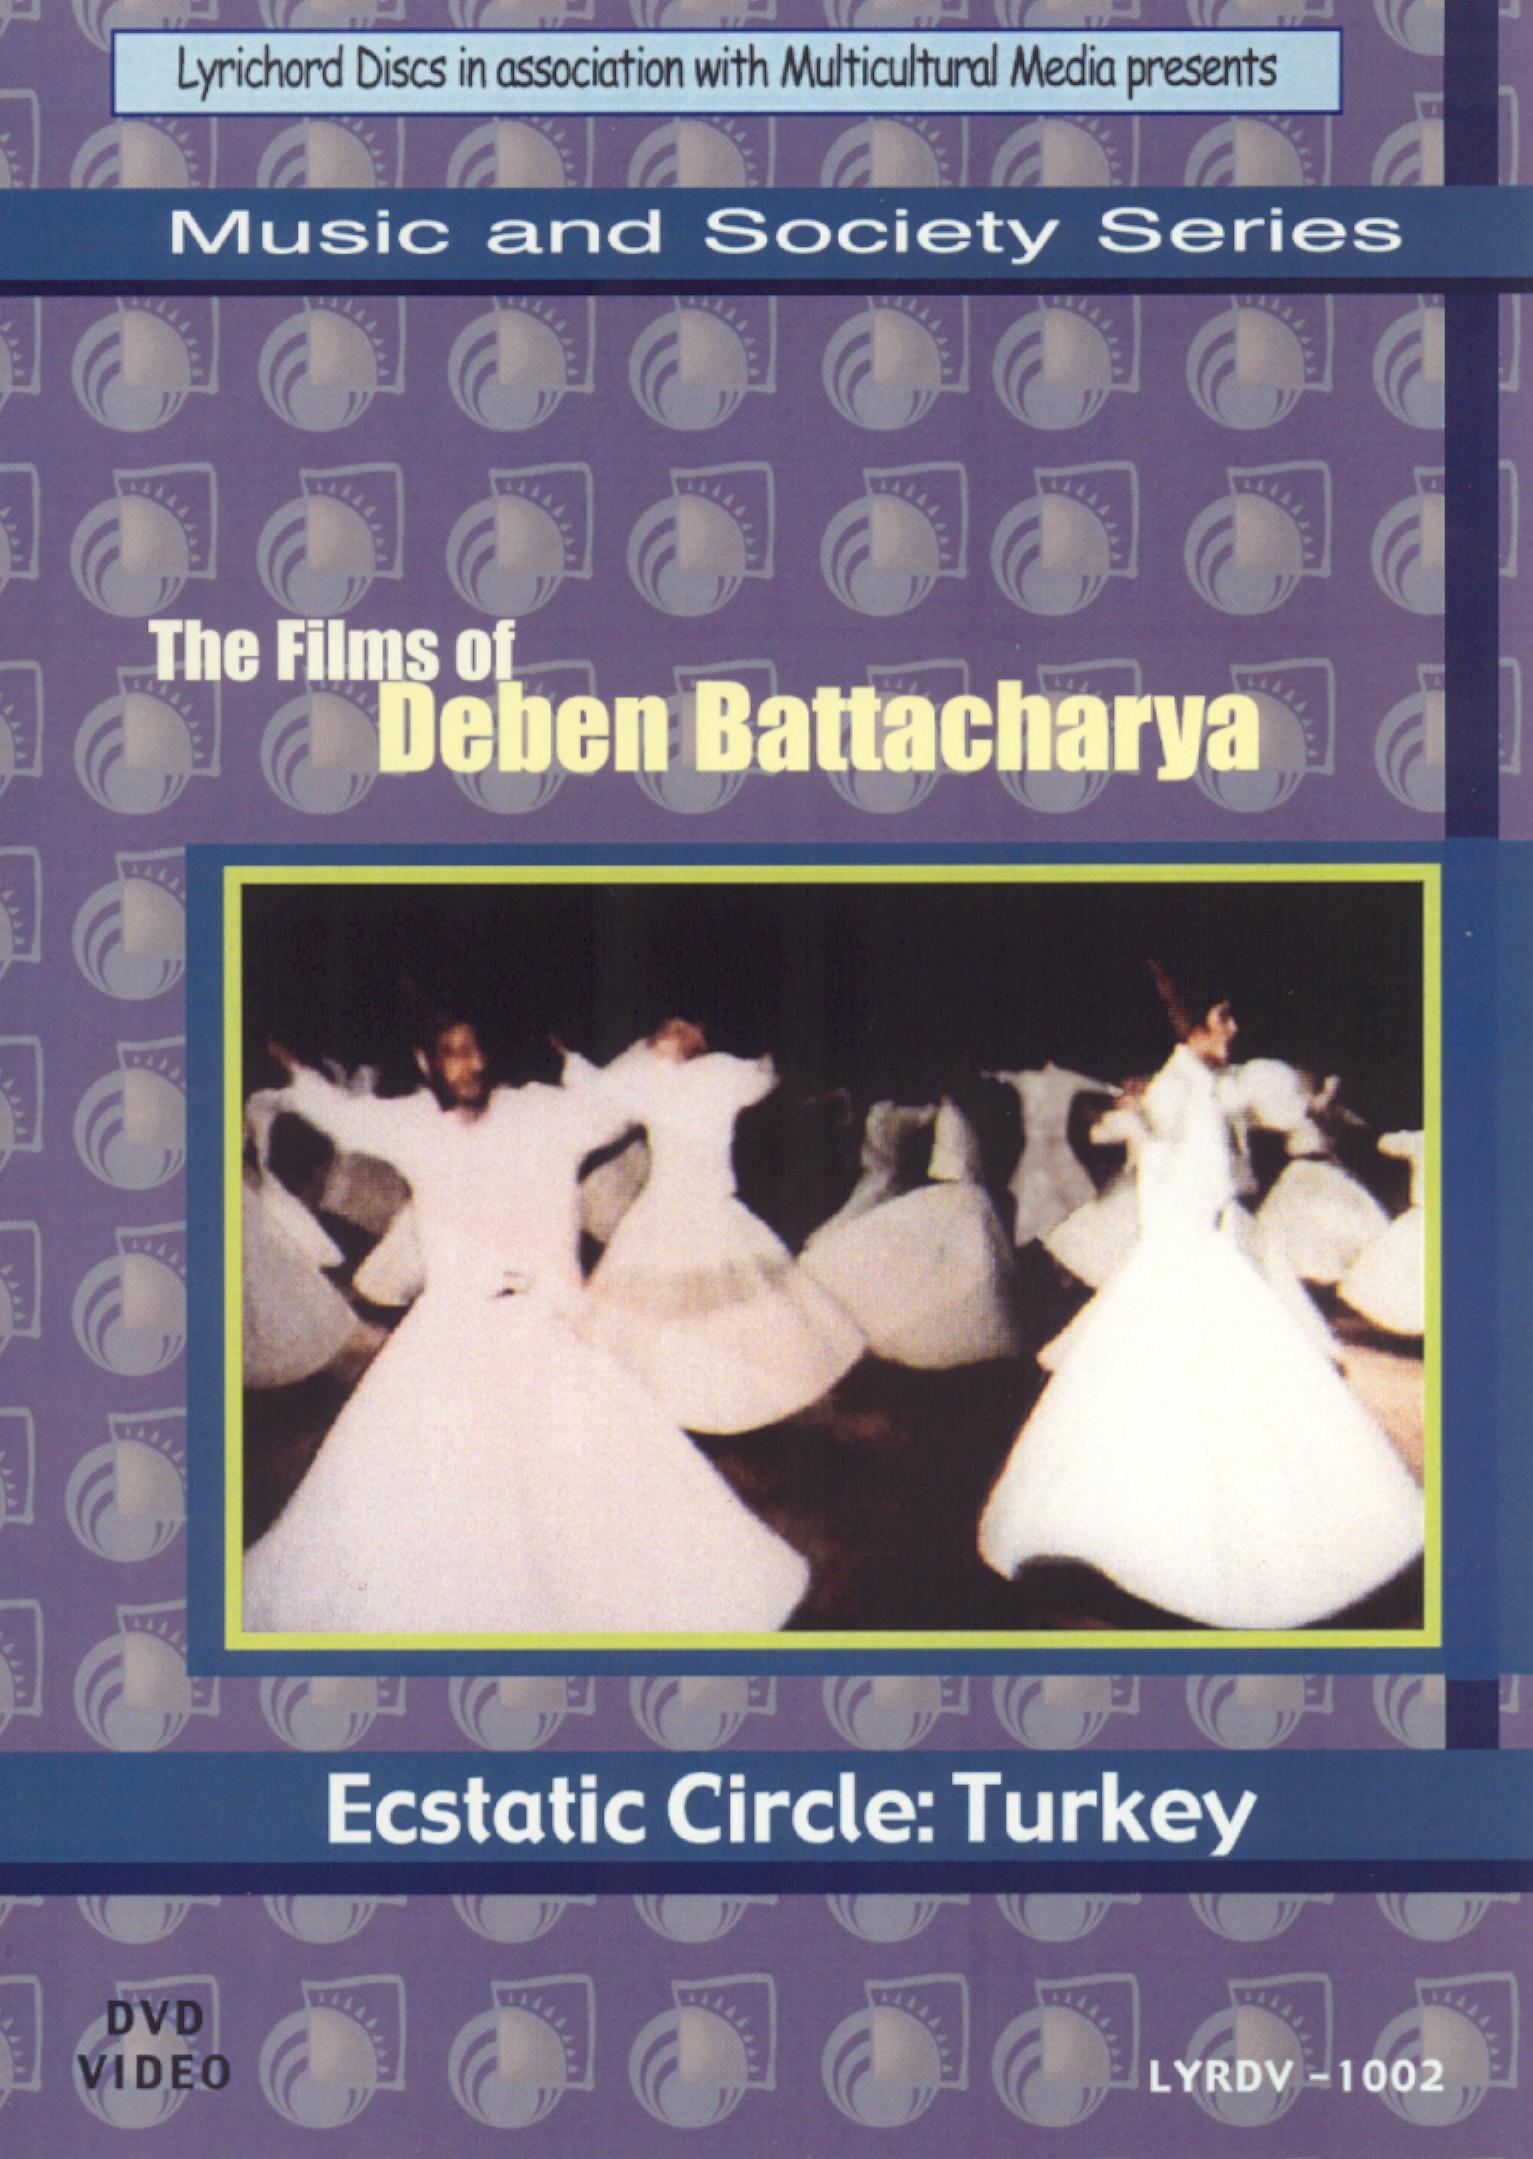 Ecstatic Circle: Turkey